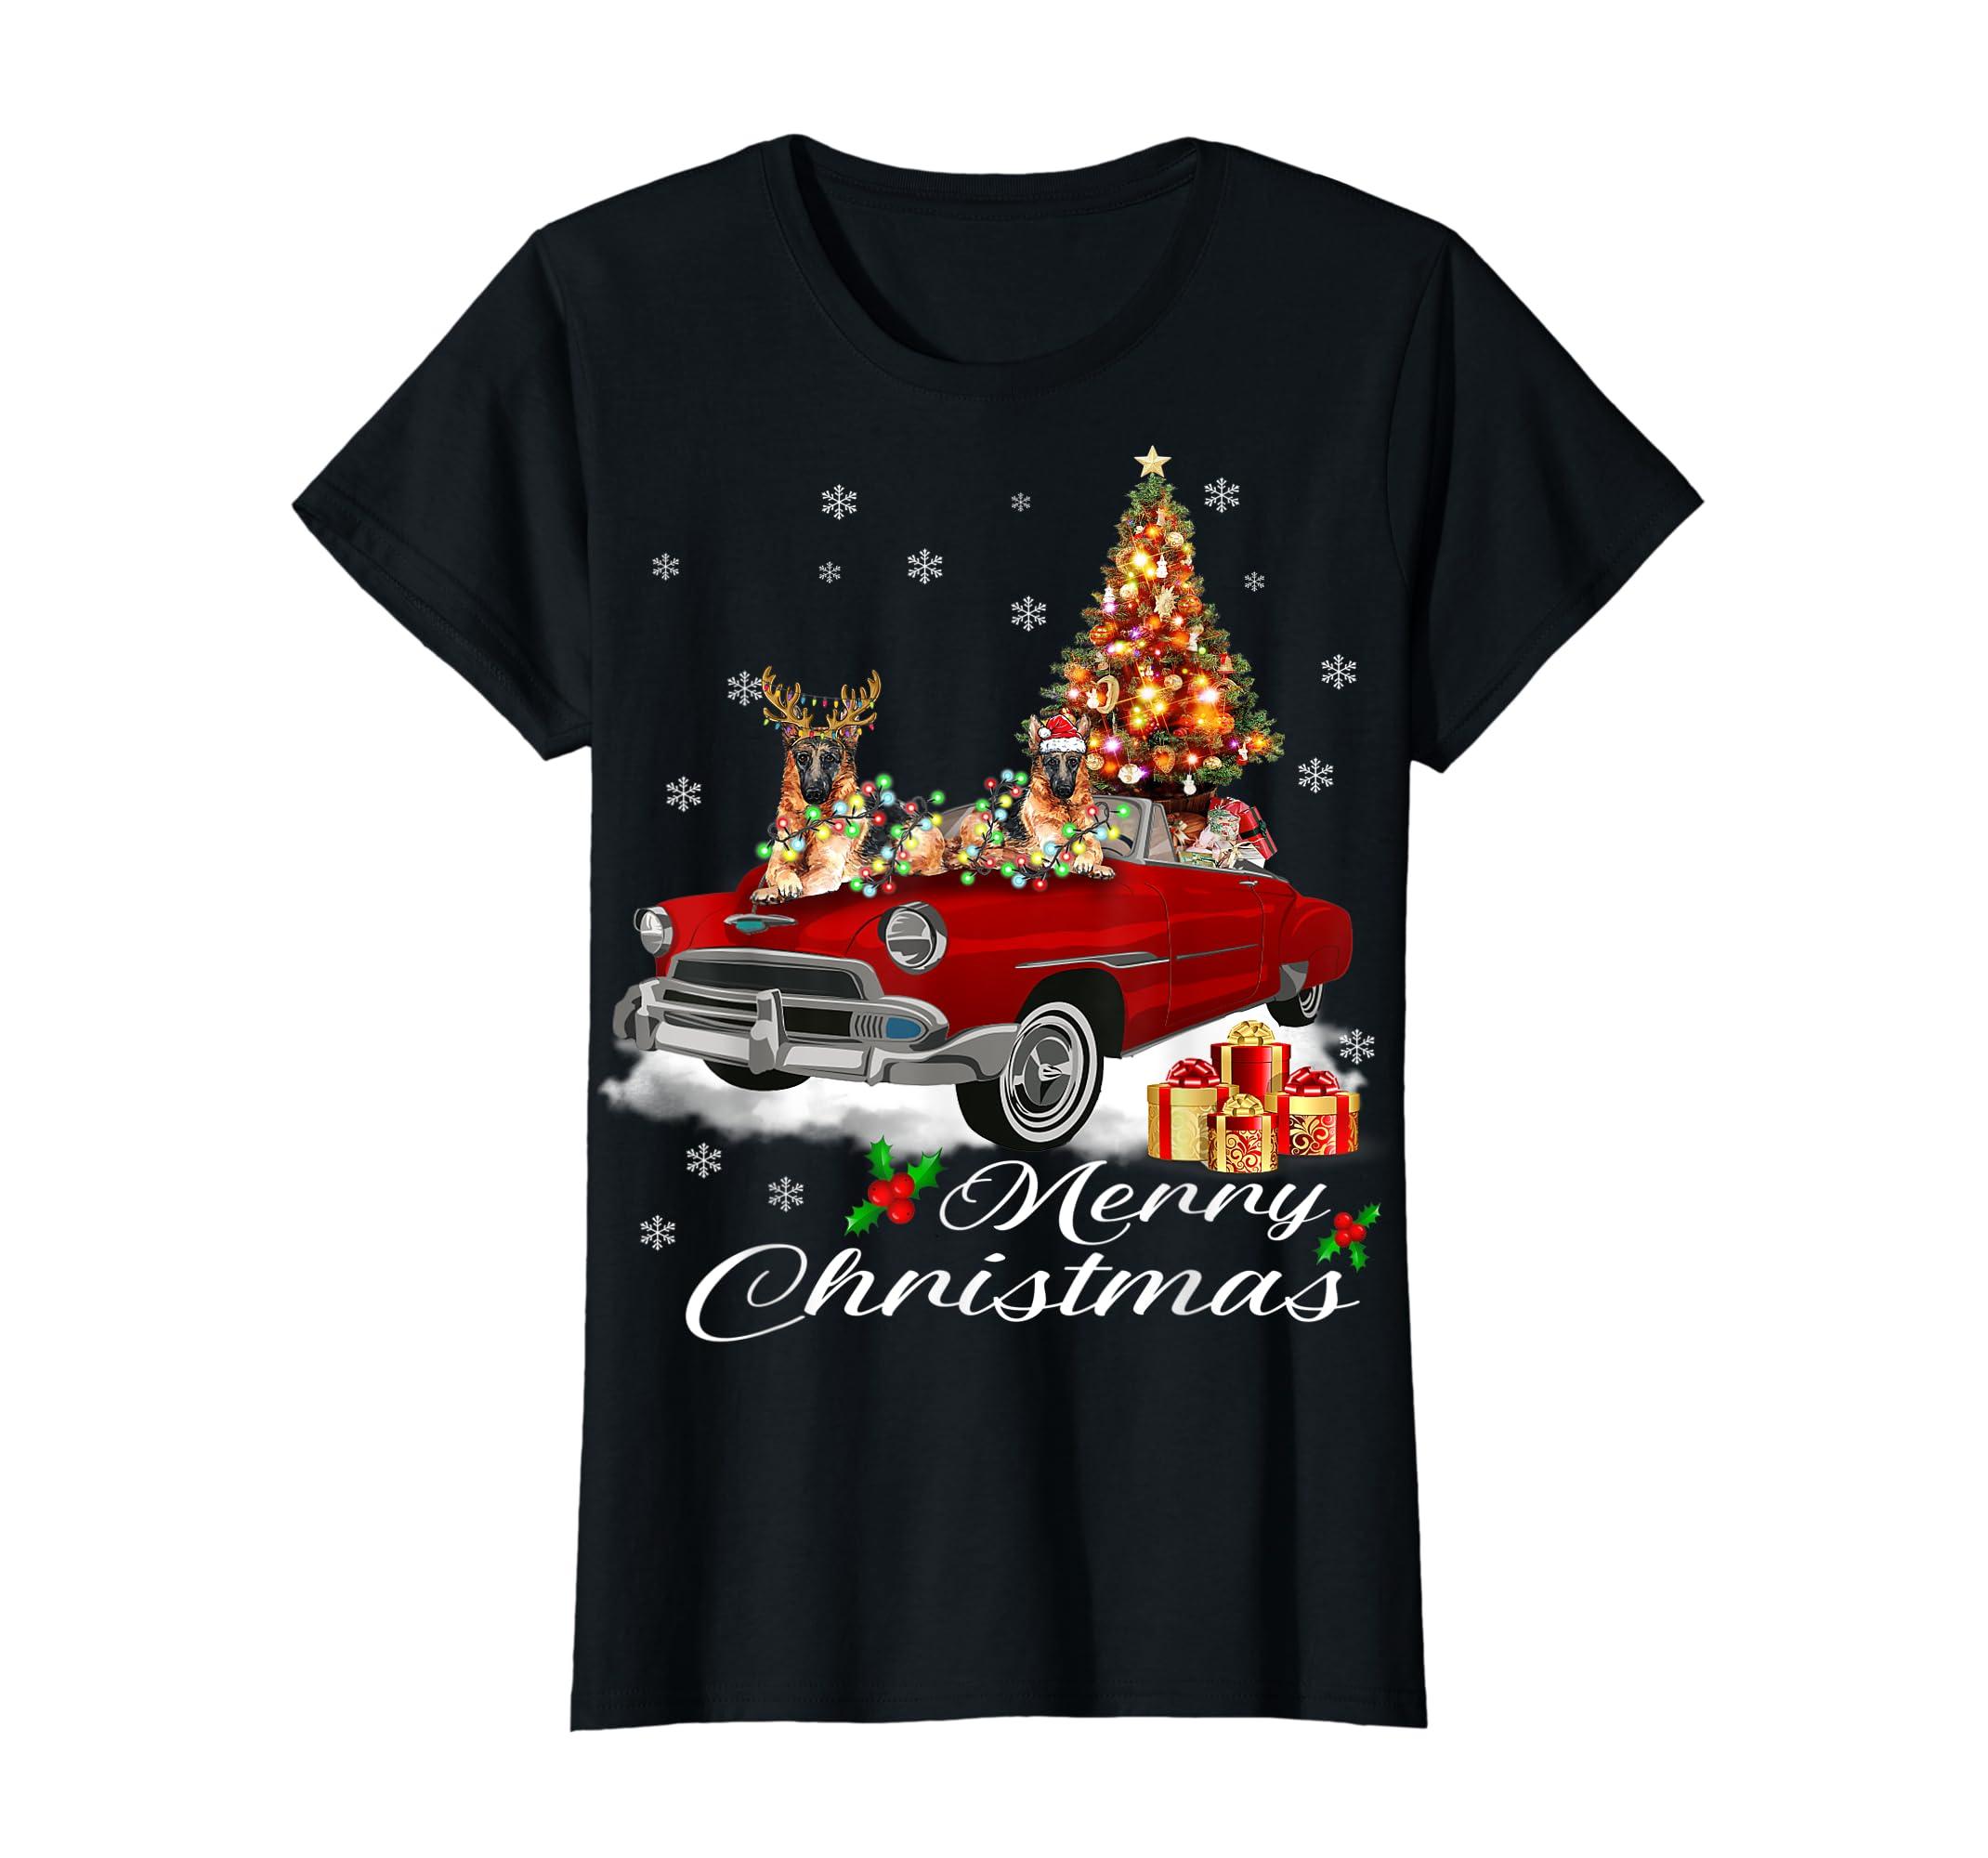 German Shepherd on Red Truck Christmas Pajama Dog Lover Gift T-Shirt-Women's T-Shirt-Black